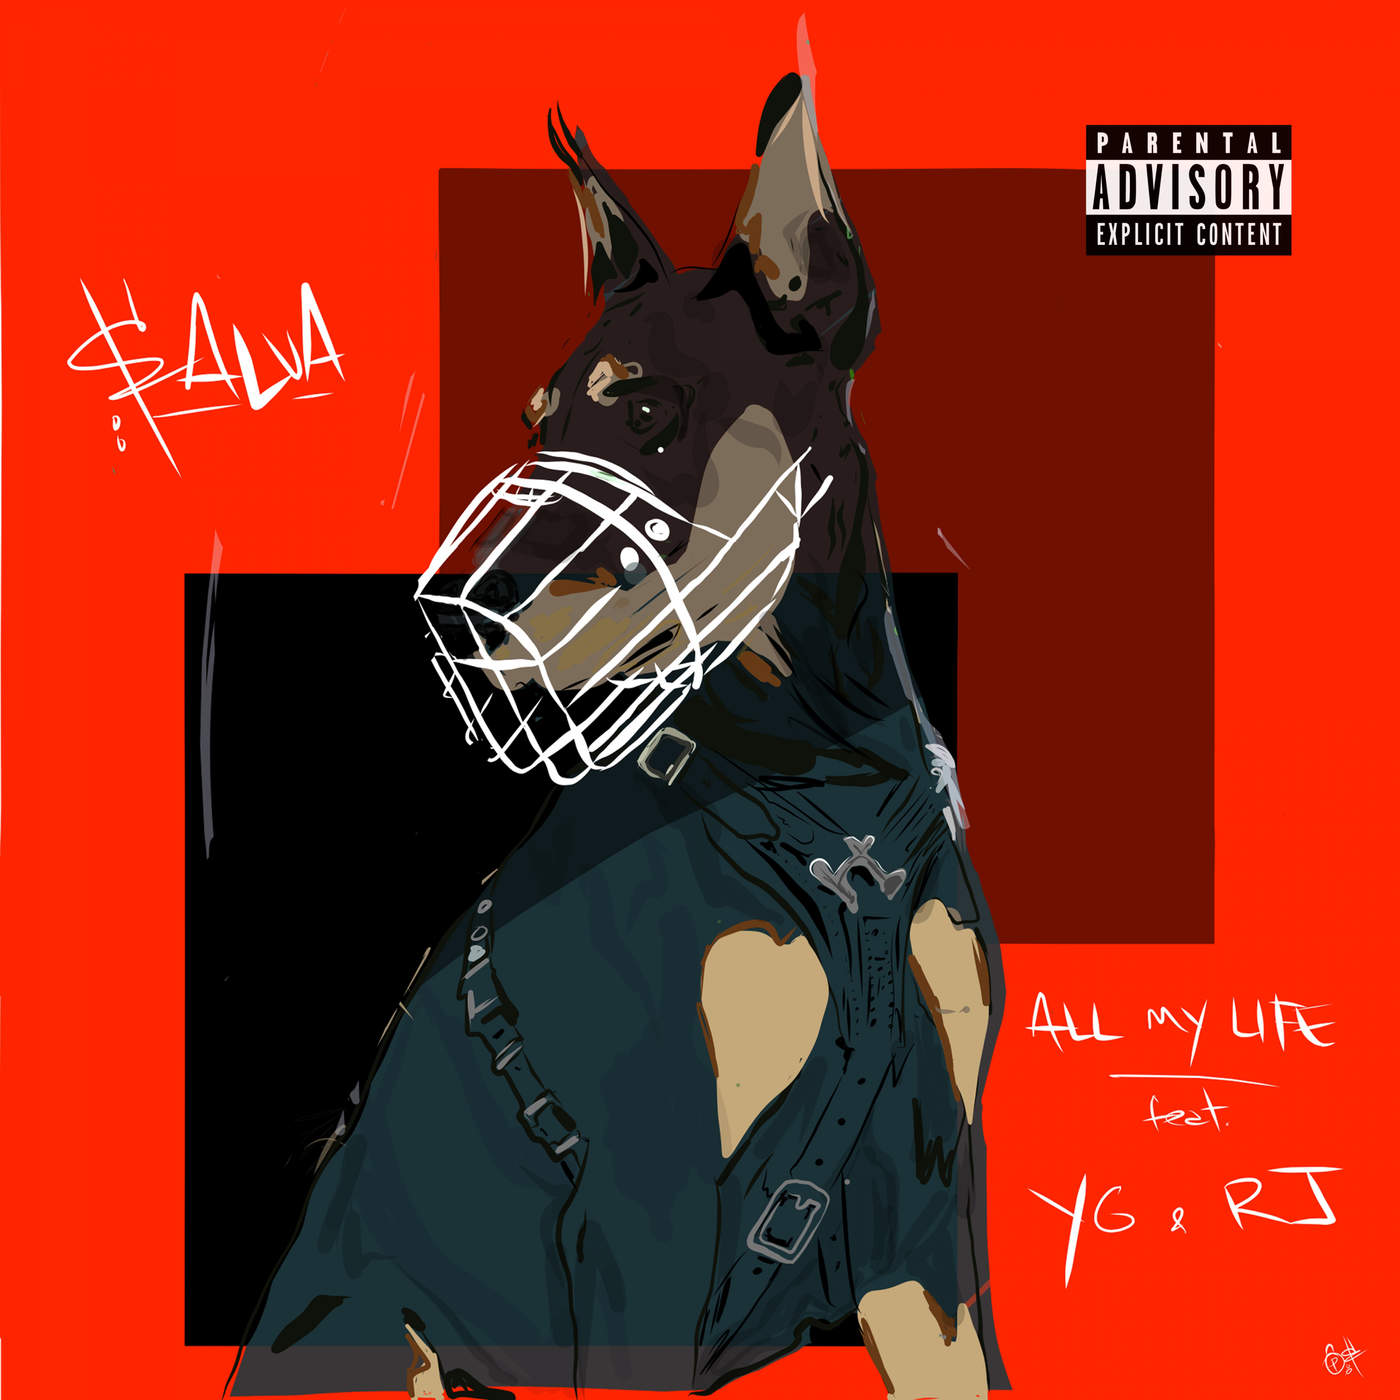 All My Life (Single) - Salva - YG - RJ